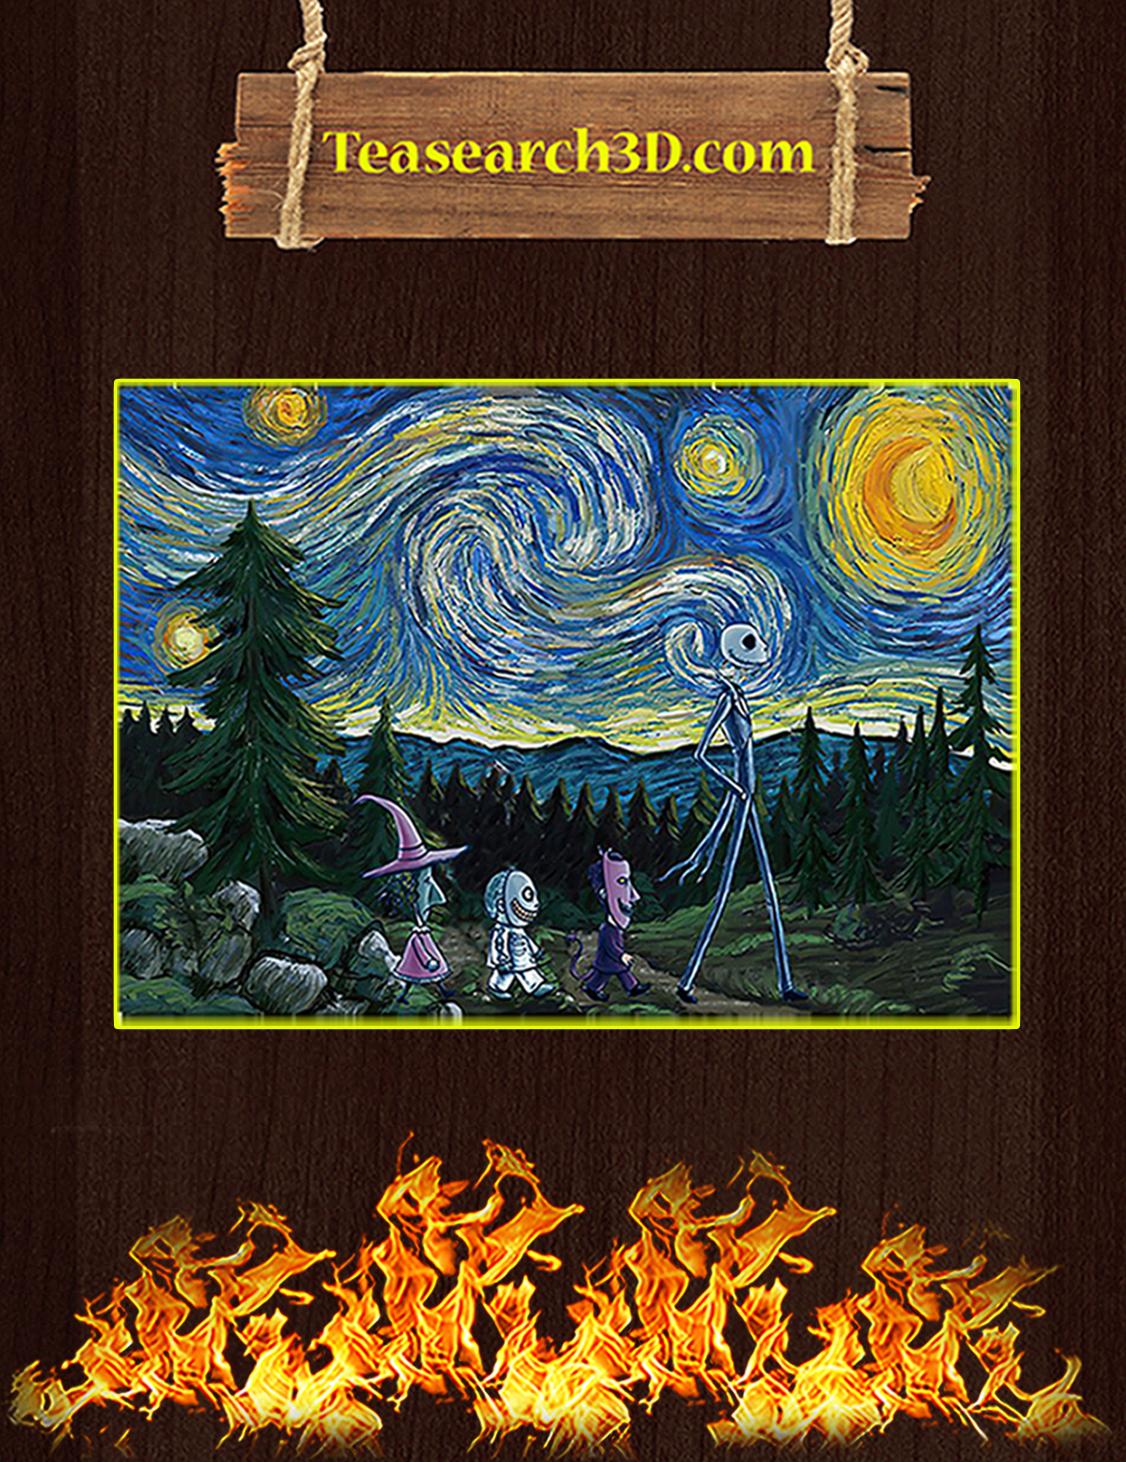 Jack skellington starry nightmare poster A3